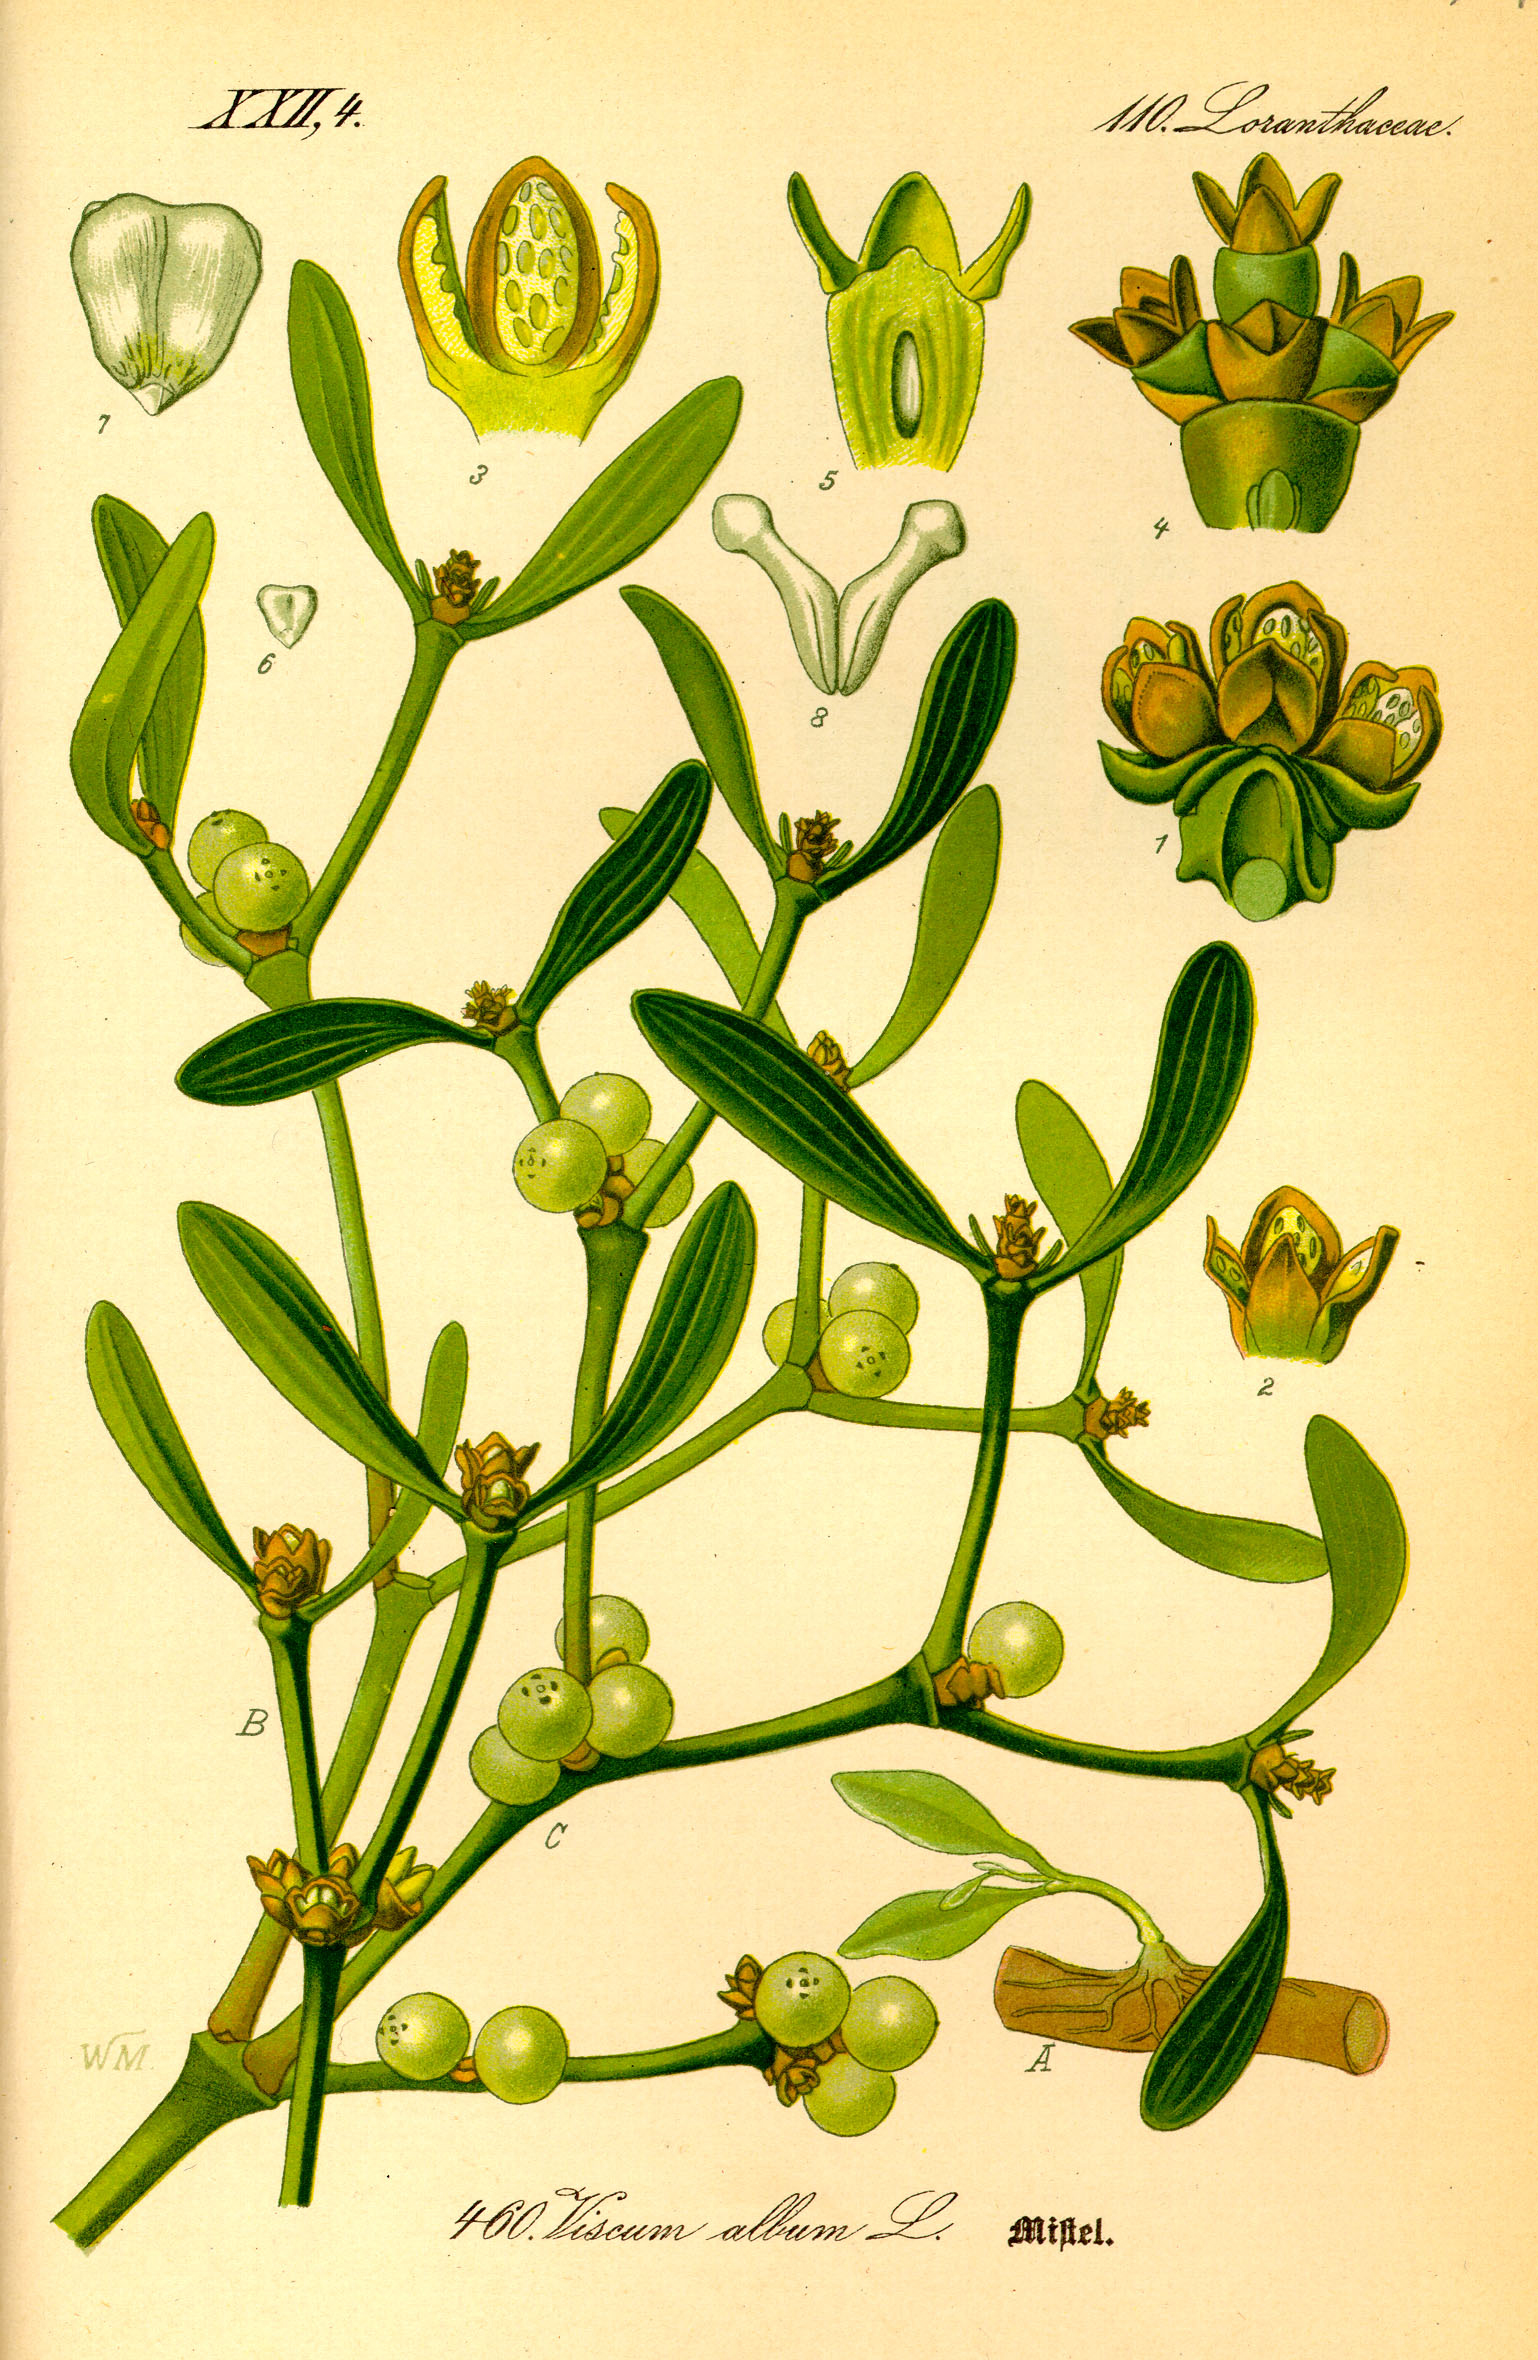 Mistletoe-illustration